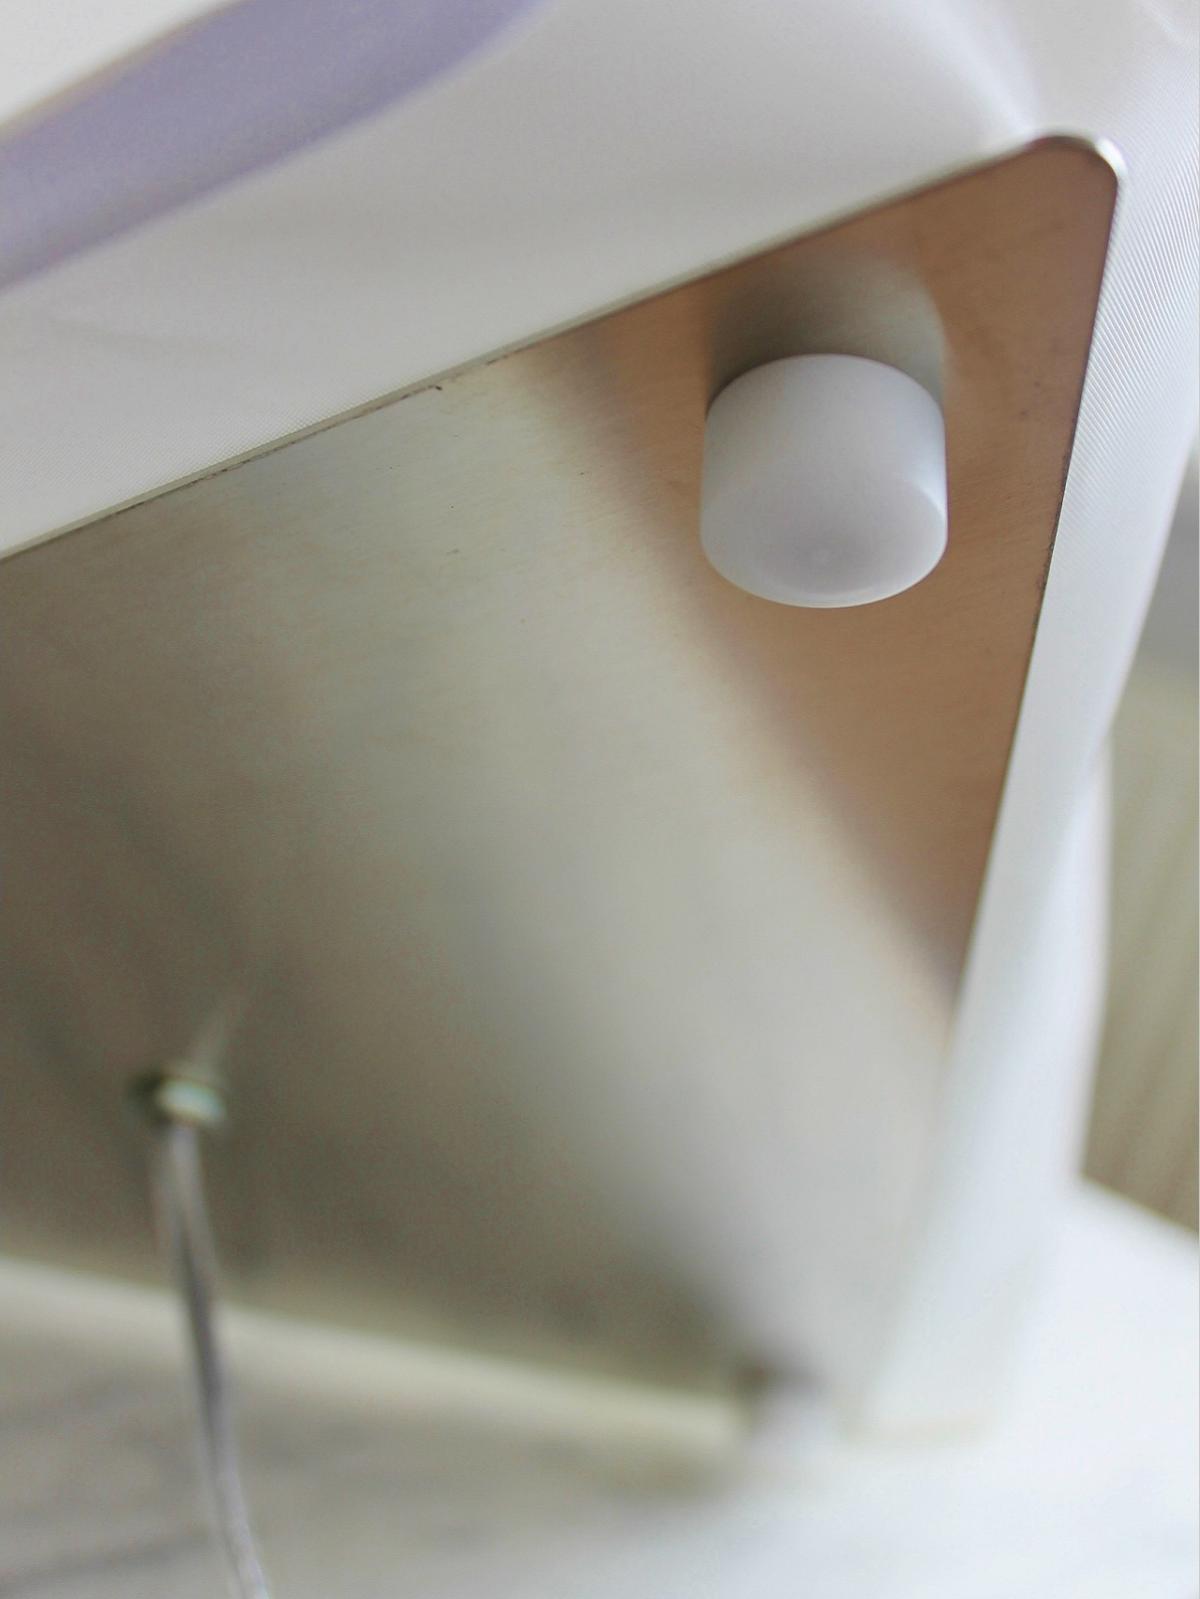 b2-gulvlampe-på-3-små-fødder-detaljer-png